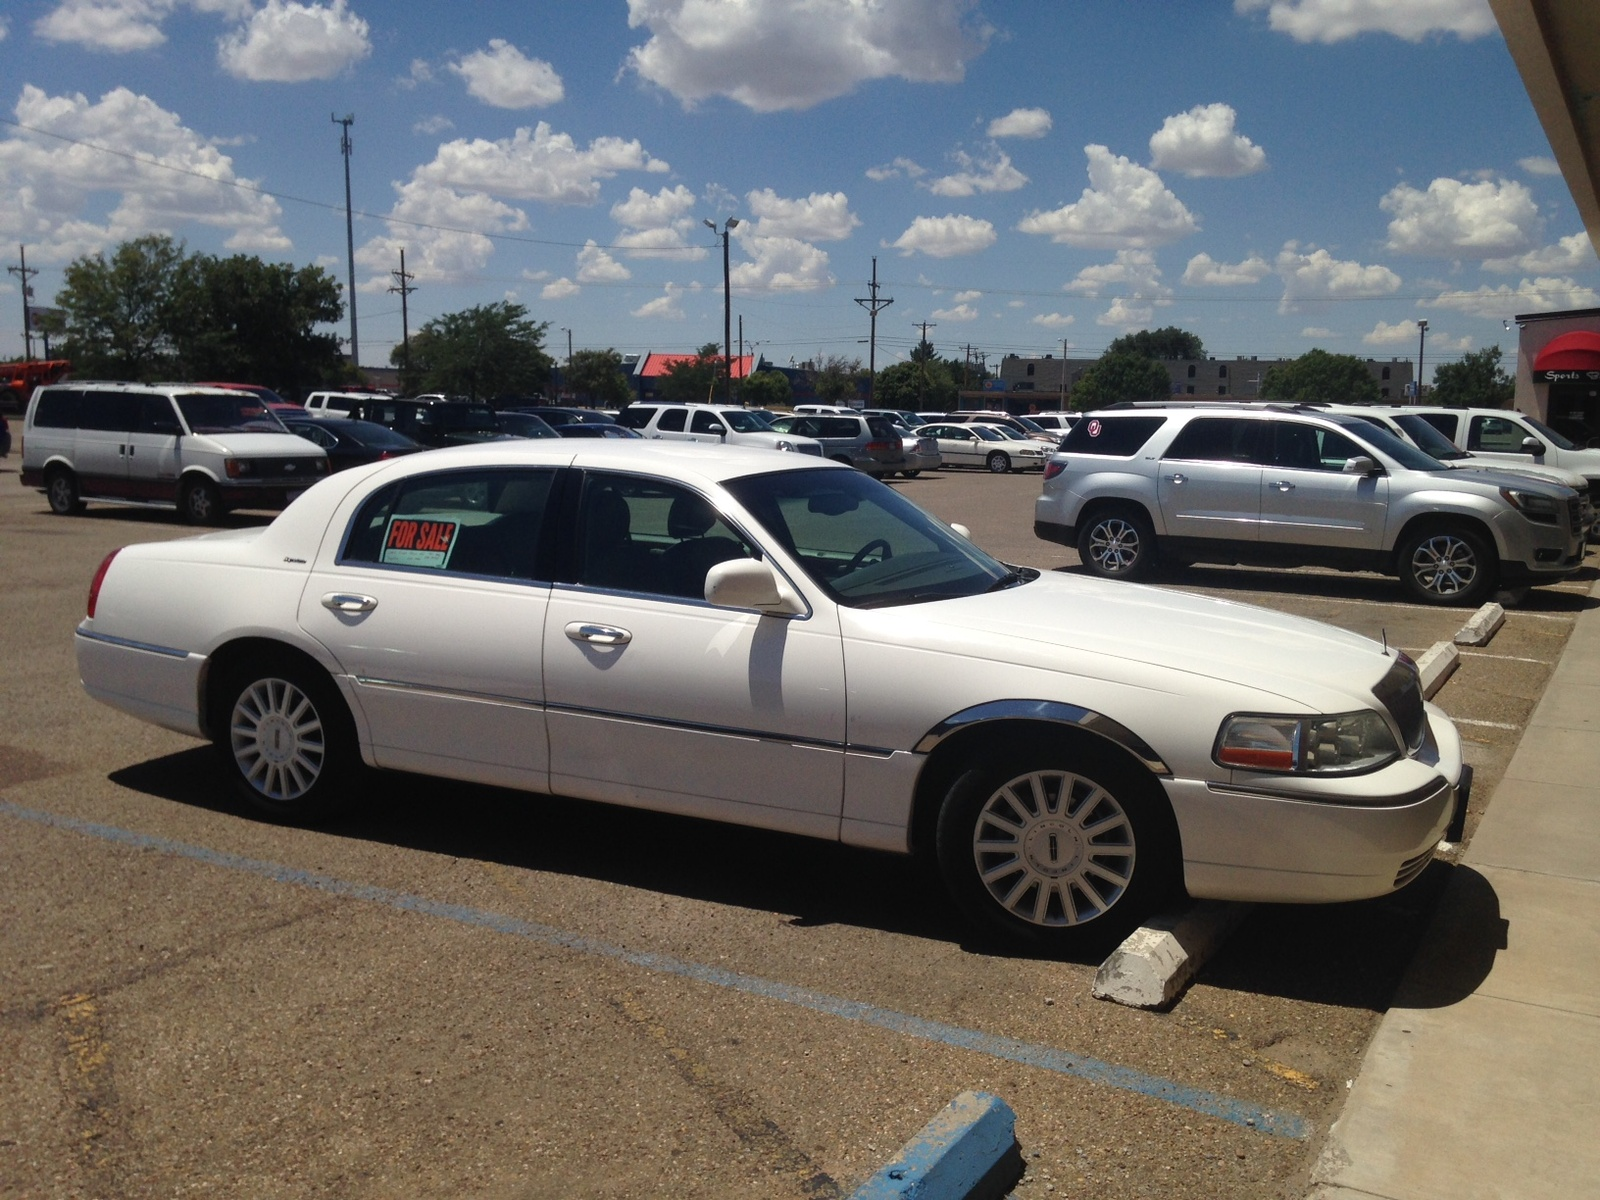 Cheap Cars For Sale in Amarillo, TX - CarGurus